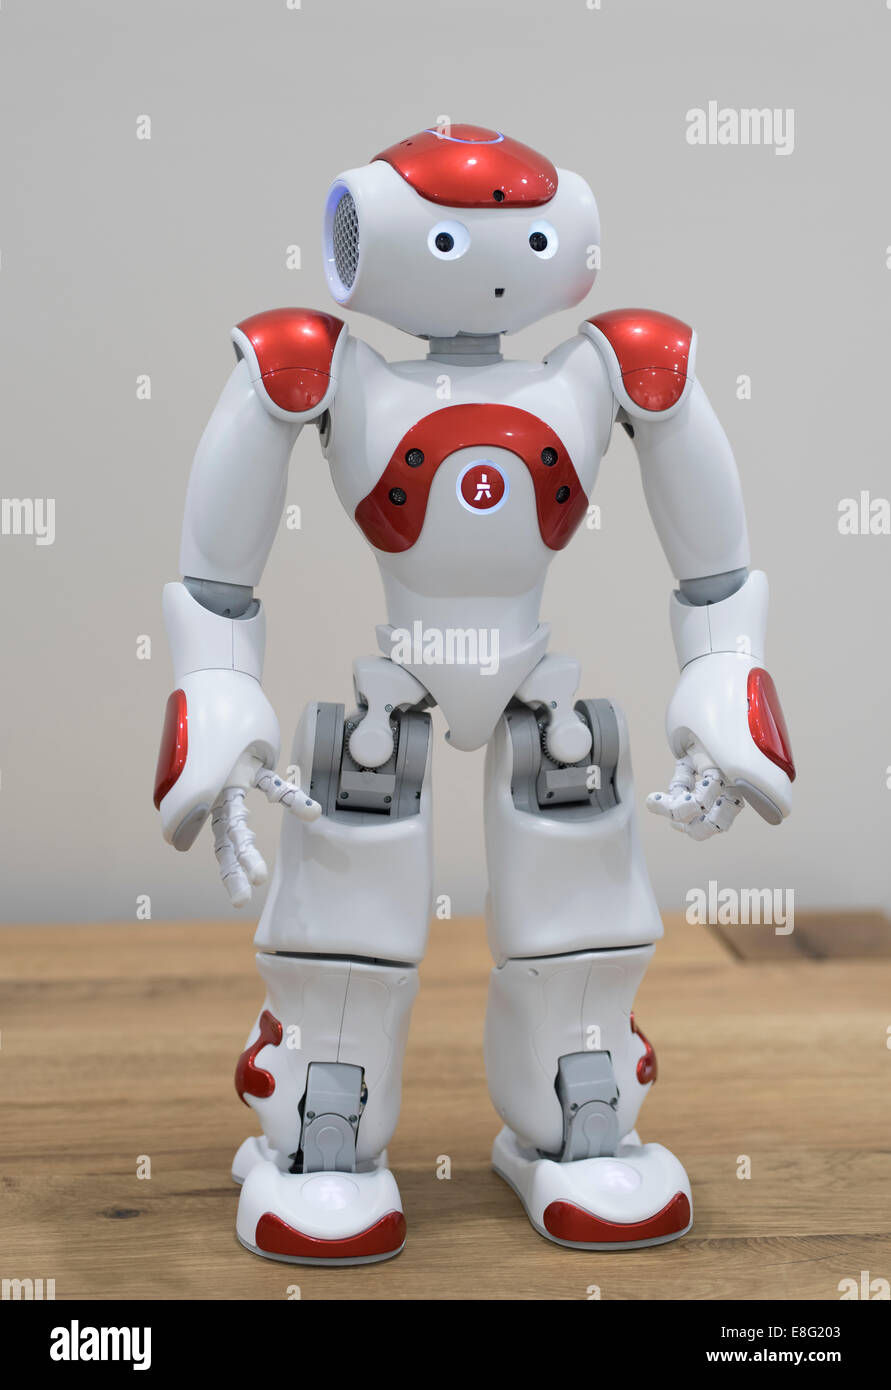 Nao an autonomous, programmable humanoid robot by Aldebaran Robotics. - Stock Image